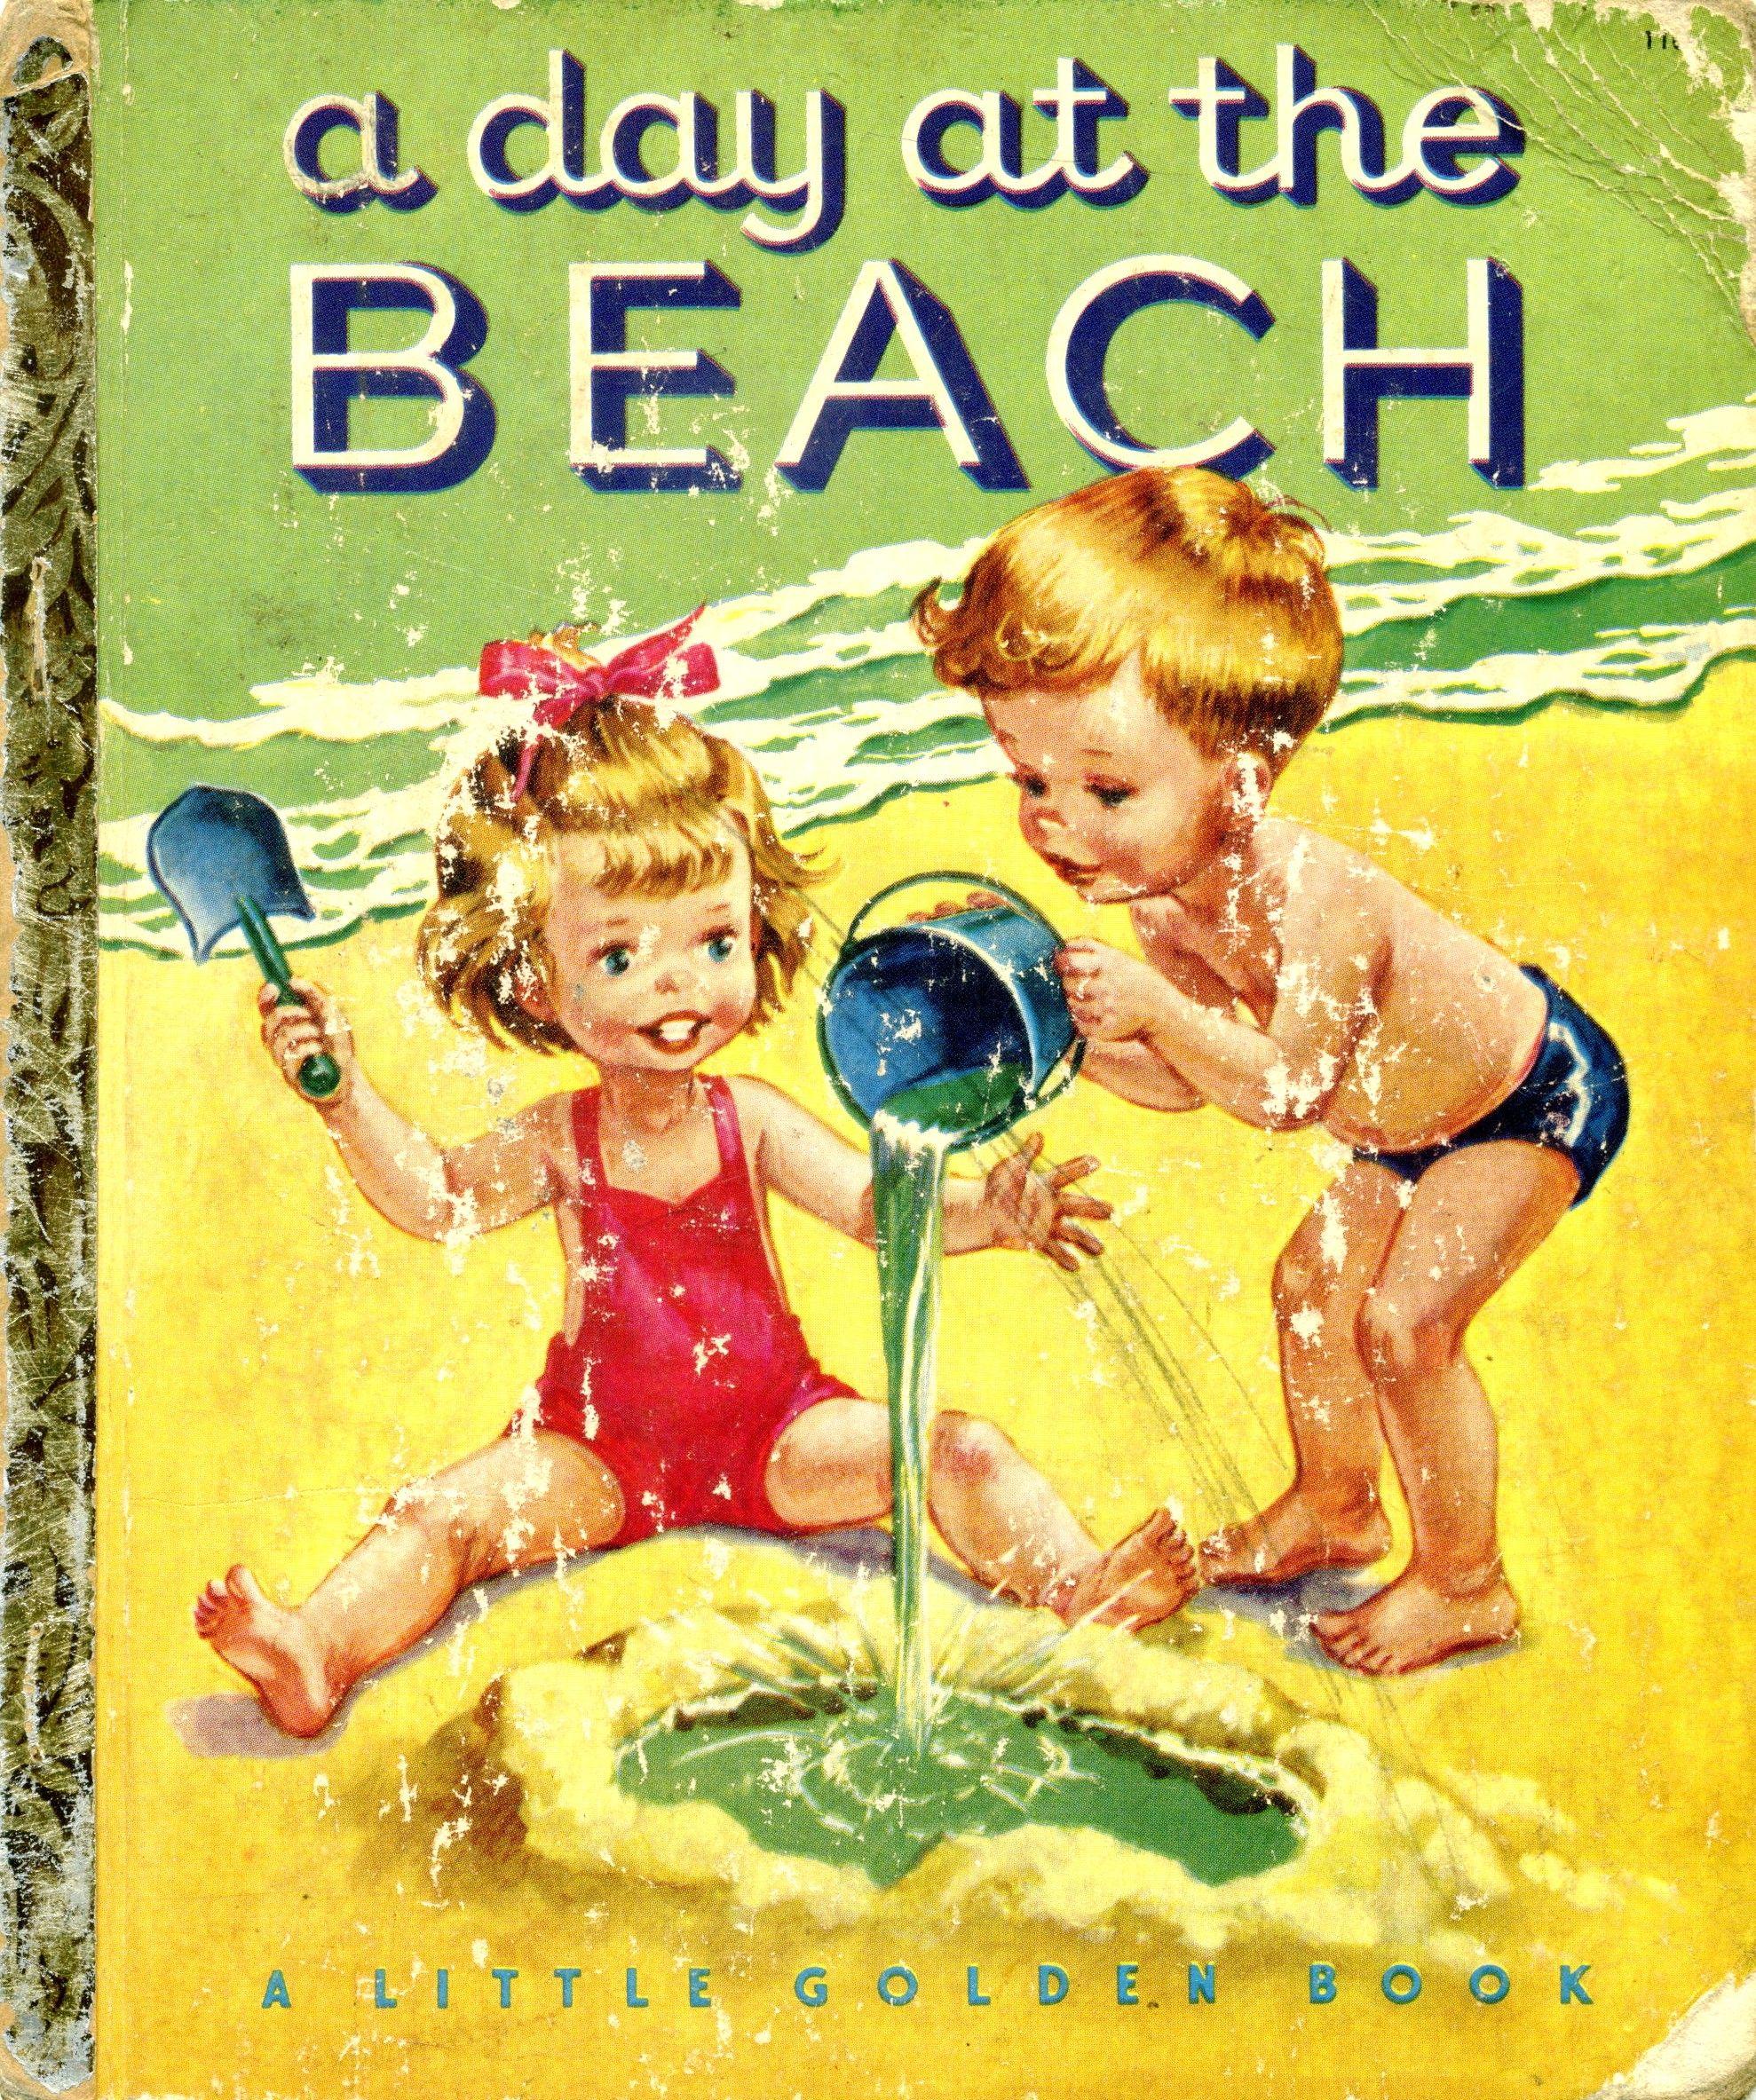 Little Golden Book A Day At The Beach 1951 Little Golden Books Classic Childrens Books Childrens Books Illustrations